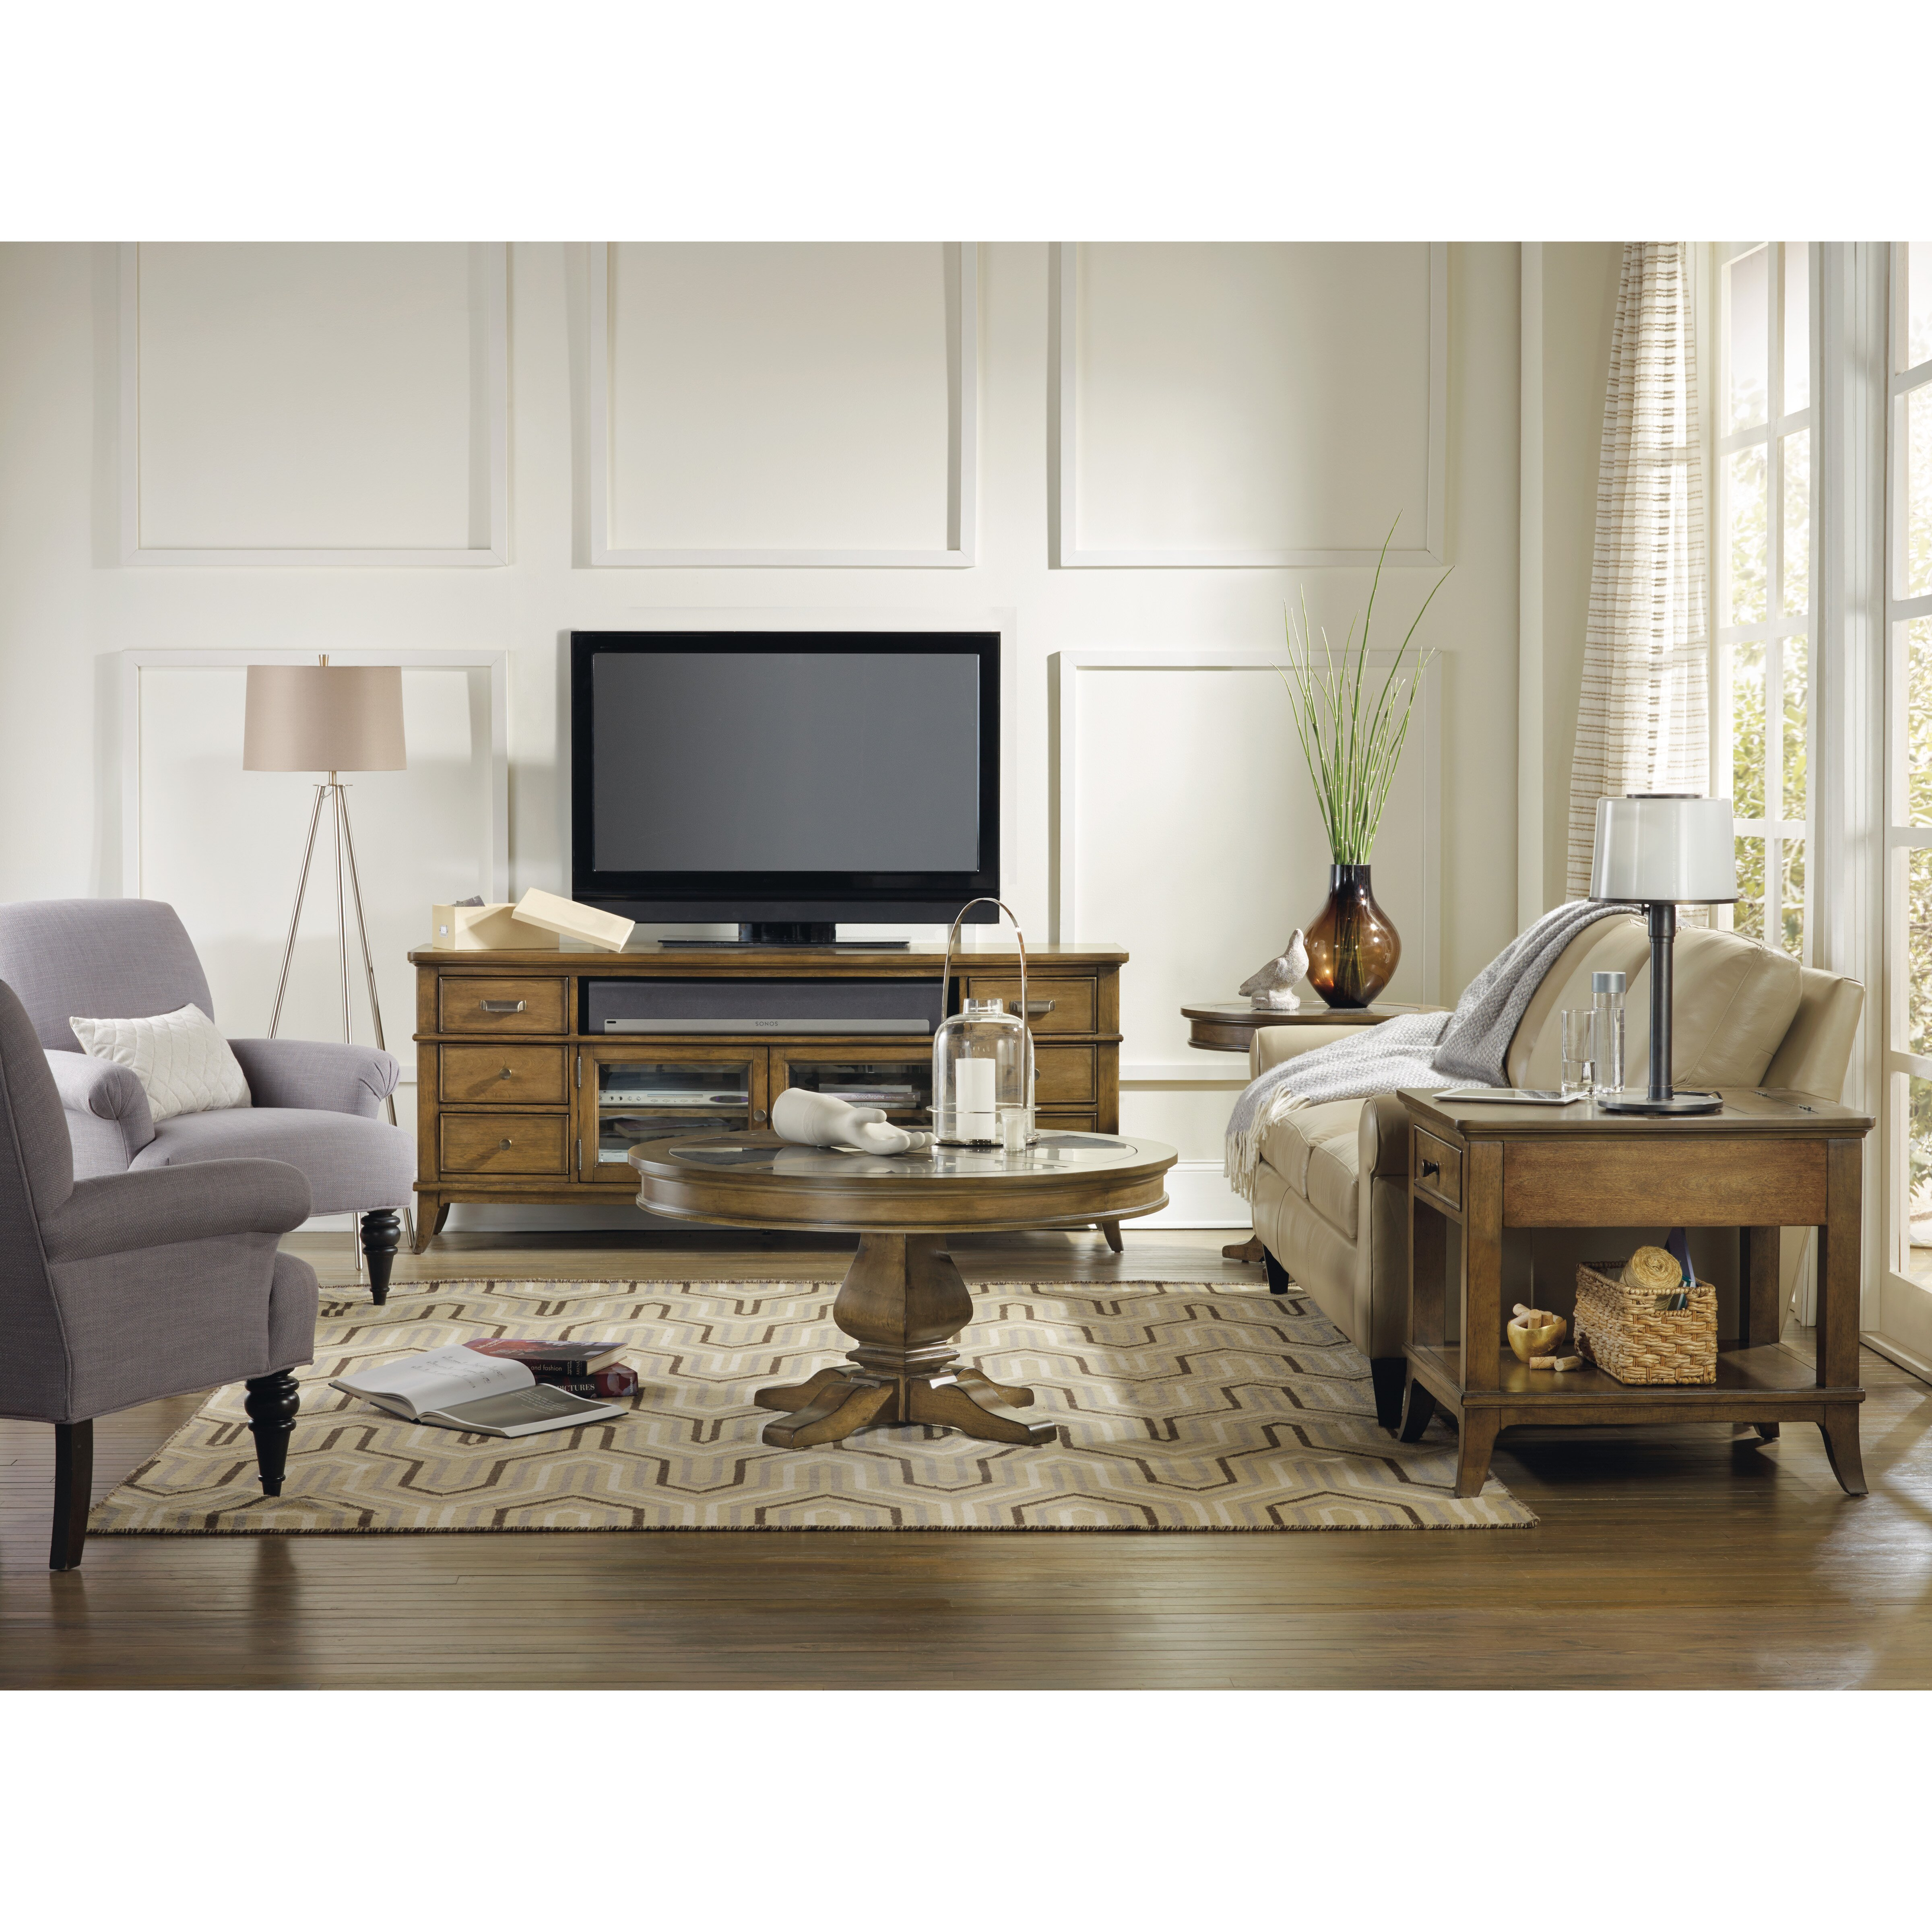 Hooker Furniture Shelbourne Coffee Table